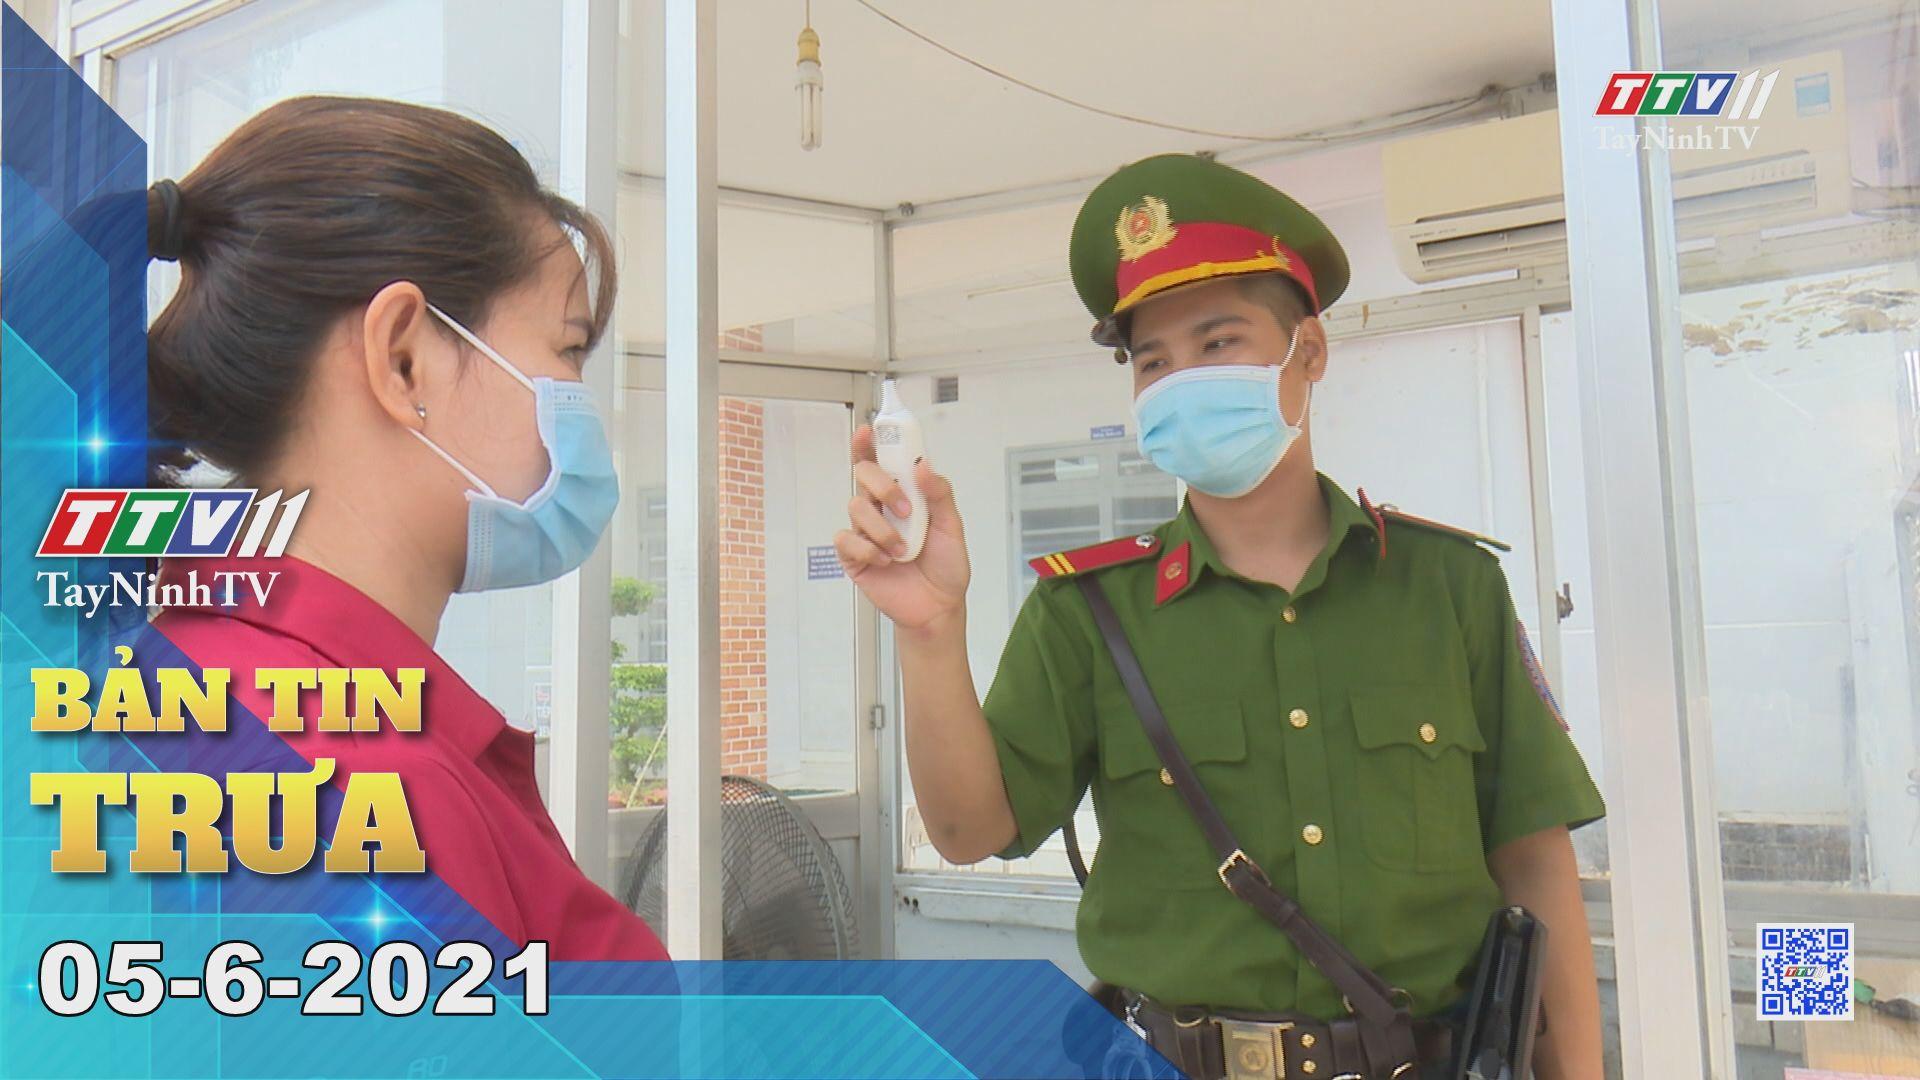 Bản tin trưa 05-6-2021 | Tin tức hôm nay | TayNinhTV